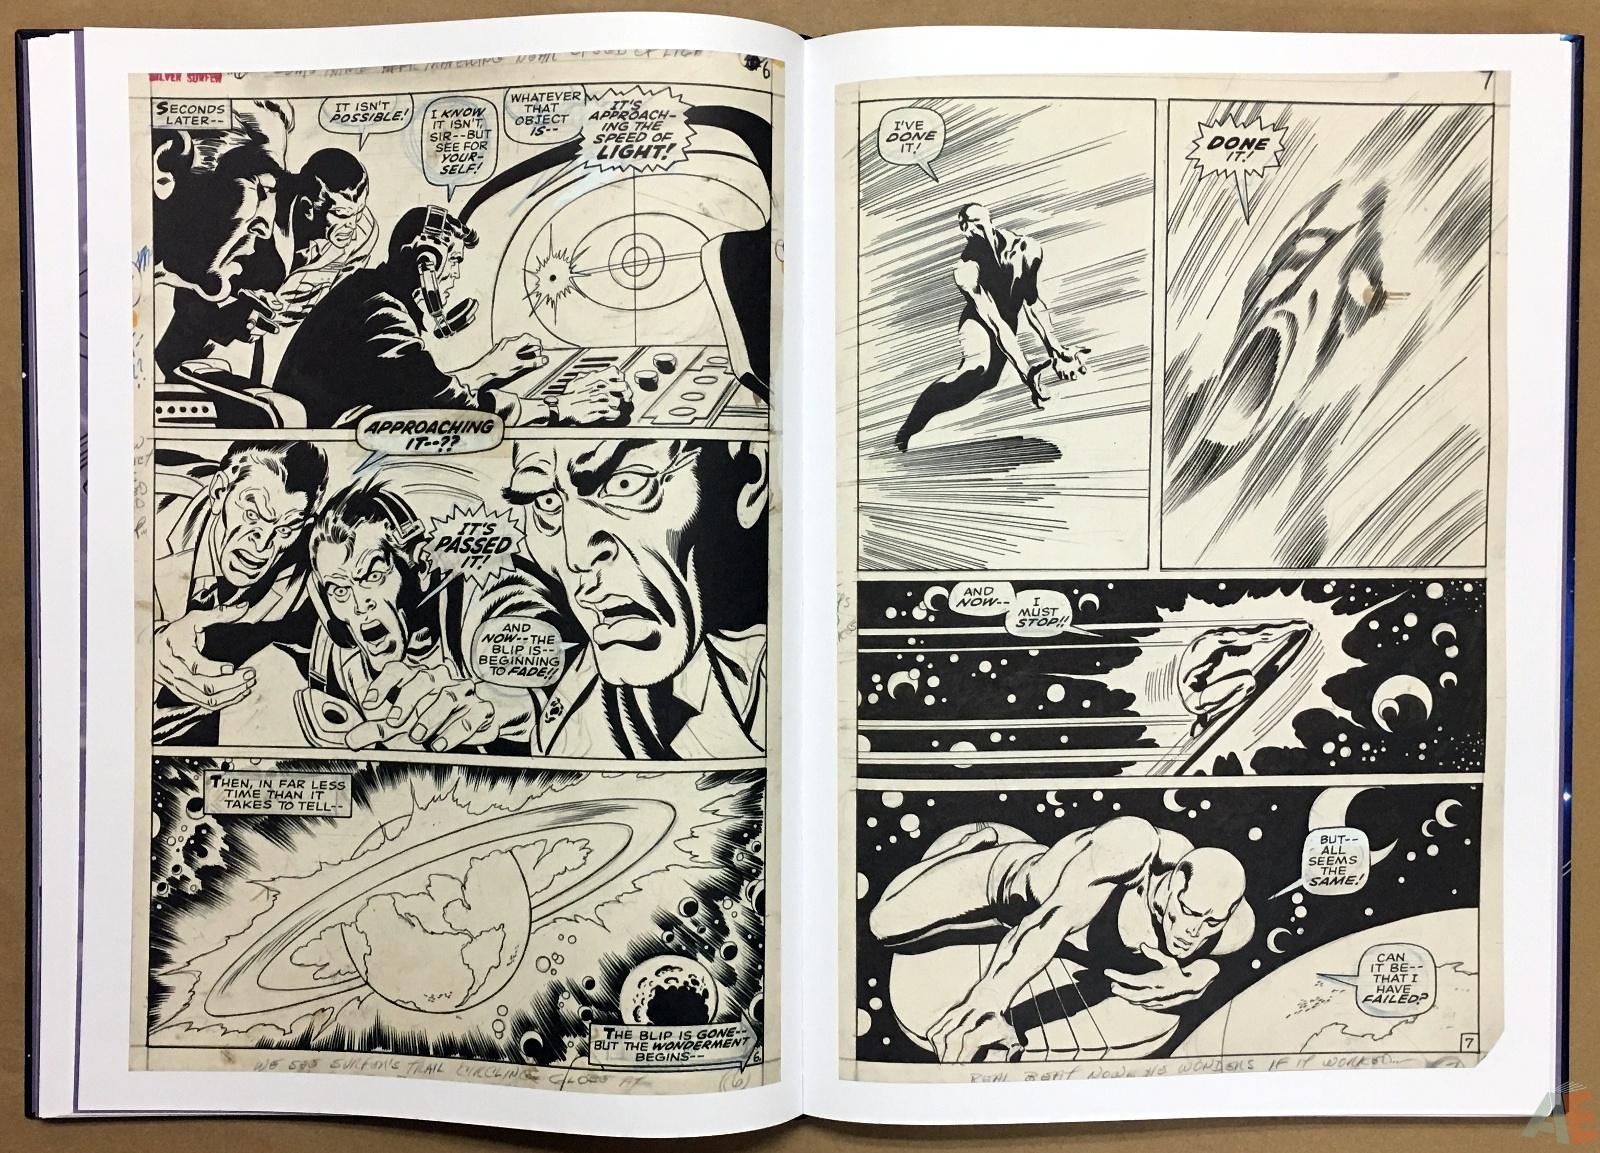 John Buscema's Silver Surfer Artist's Edition 18